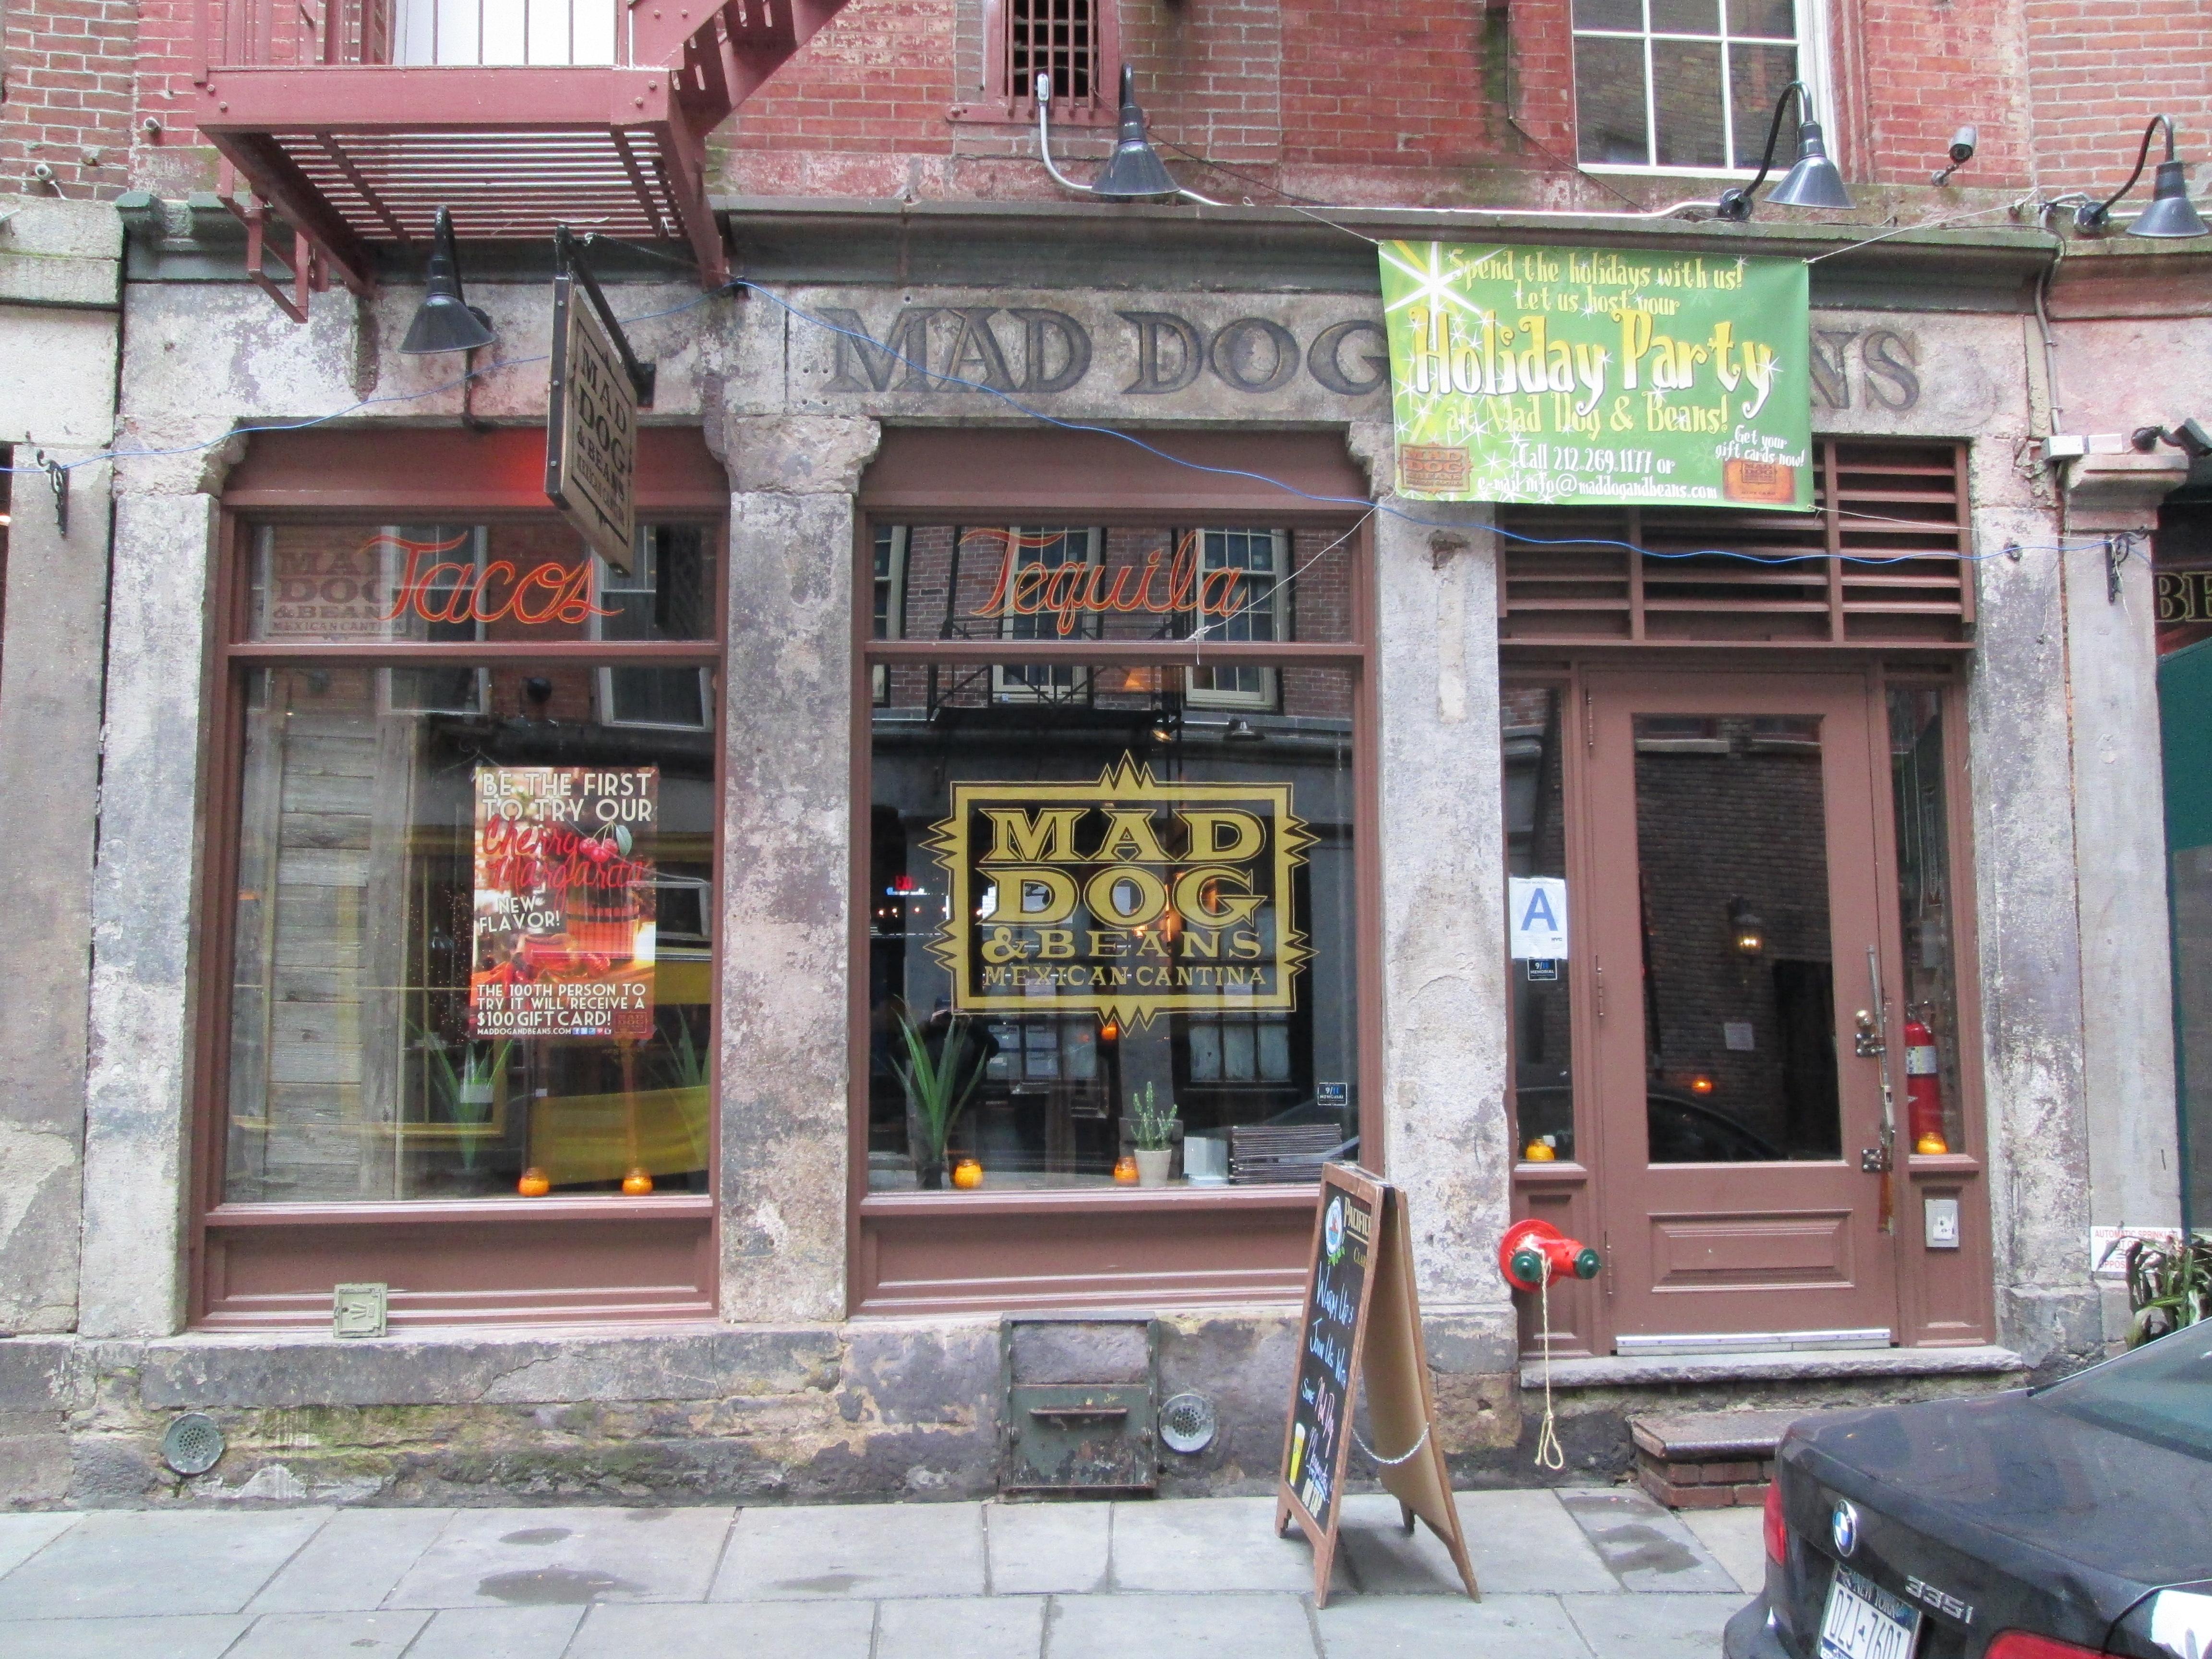 mad dog stone street